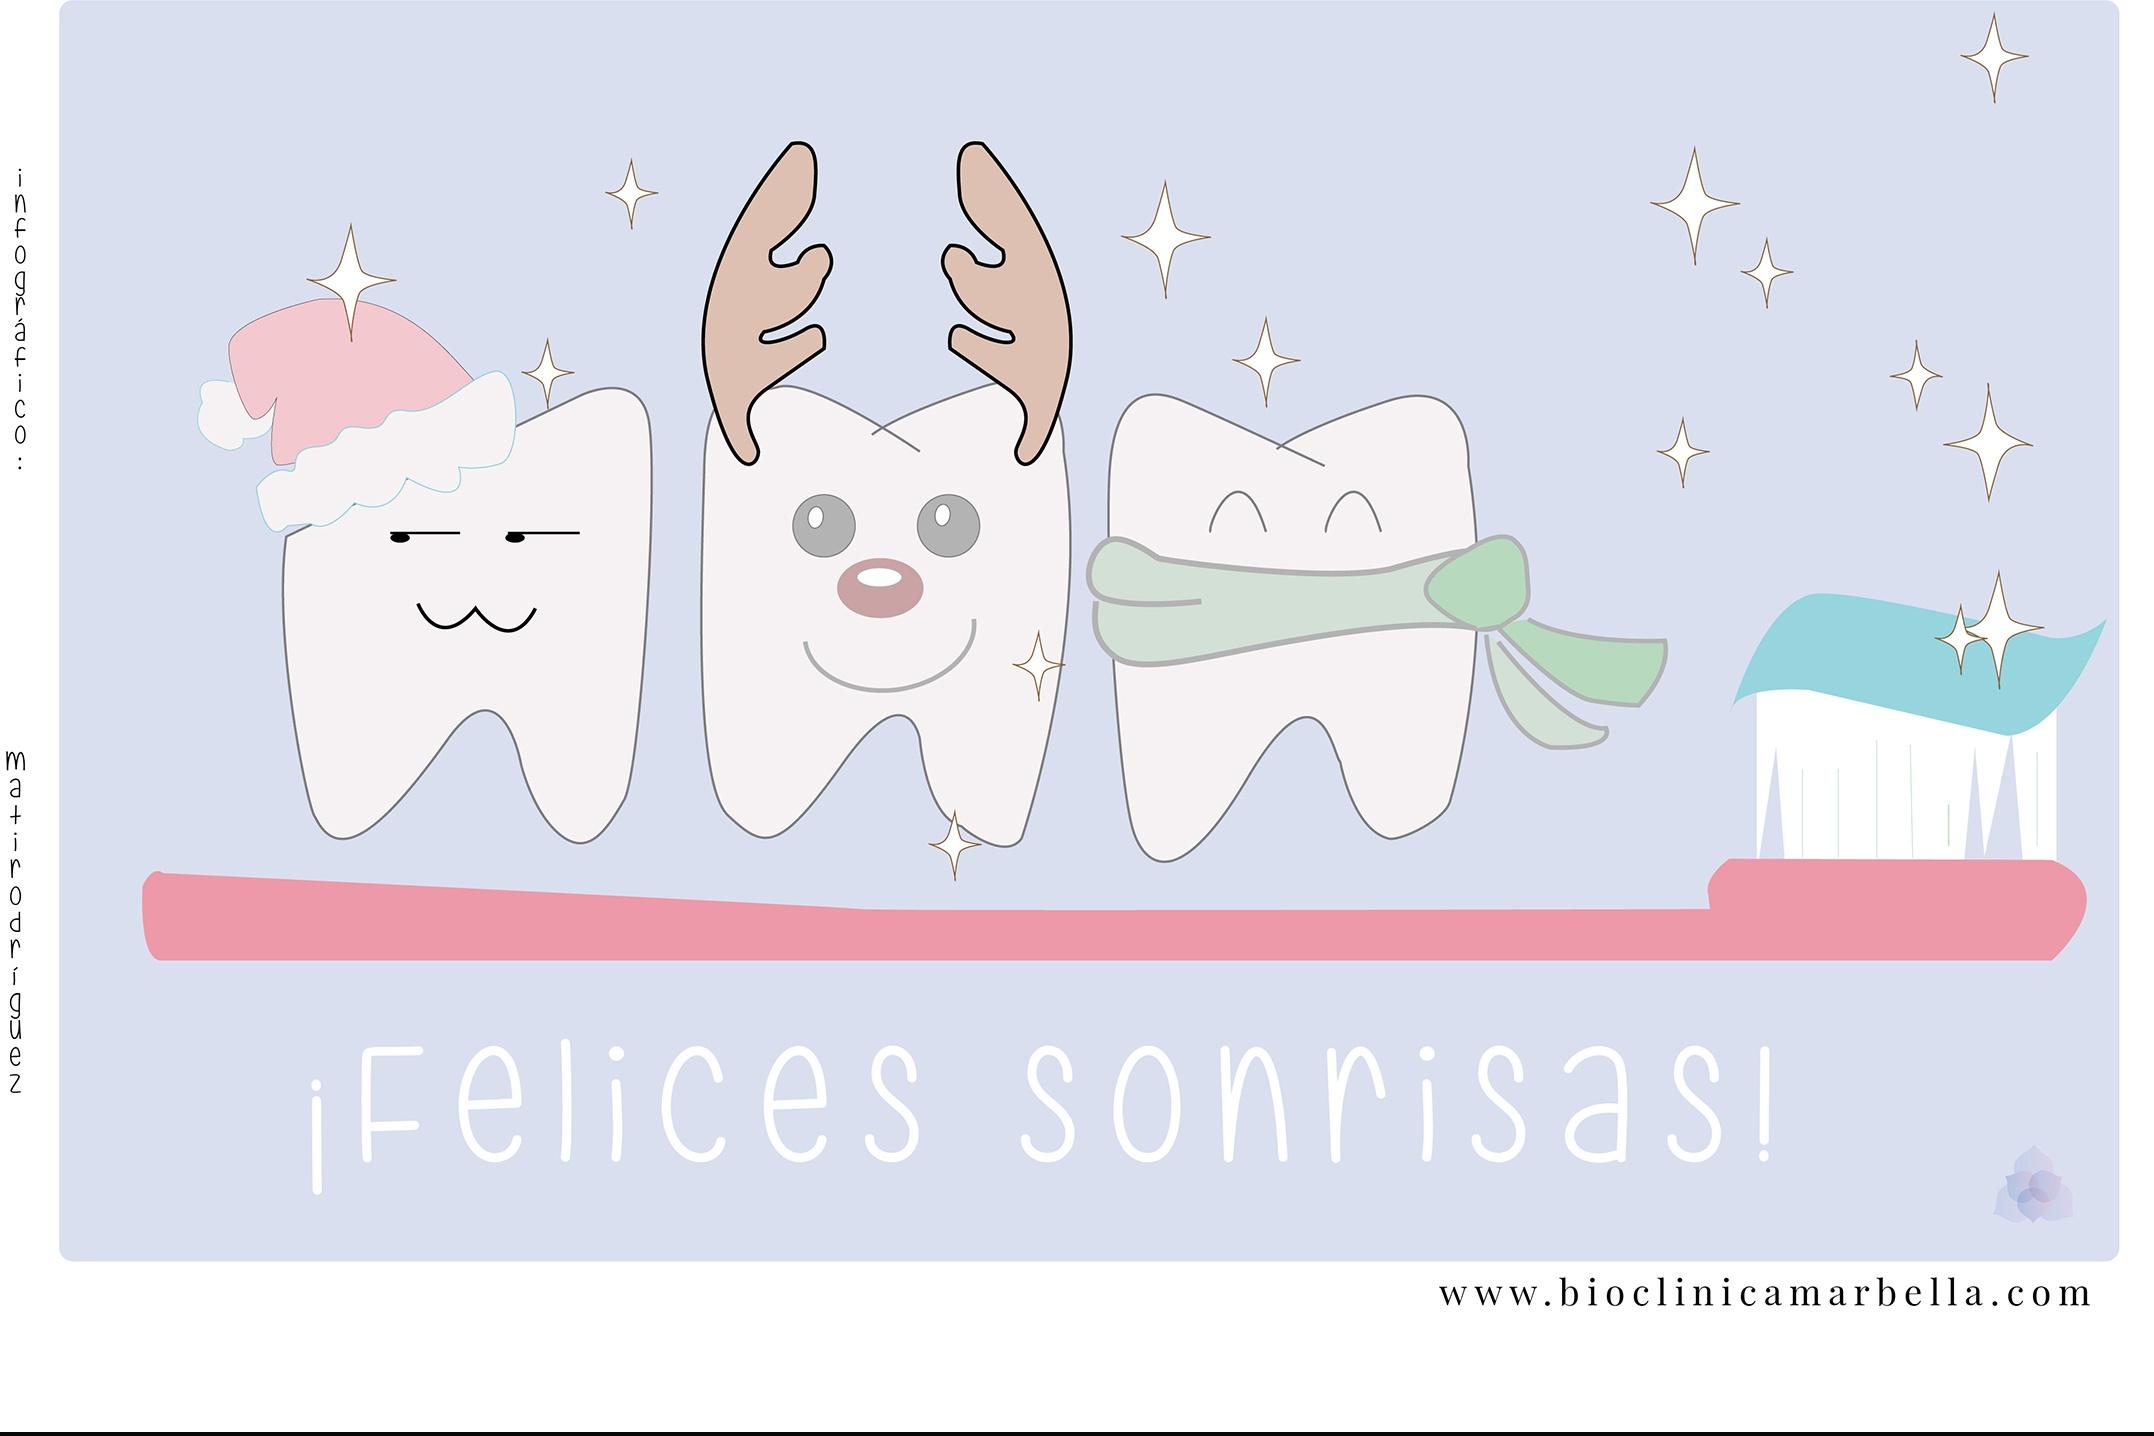 navidades-caries-odontologia-biologica-bioclinica-marbella-sincaries.jpg